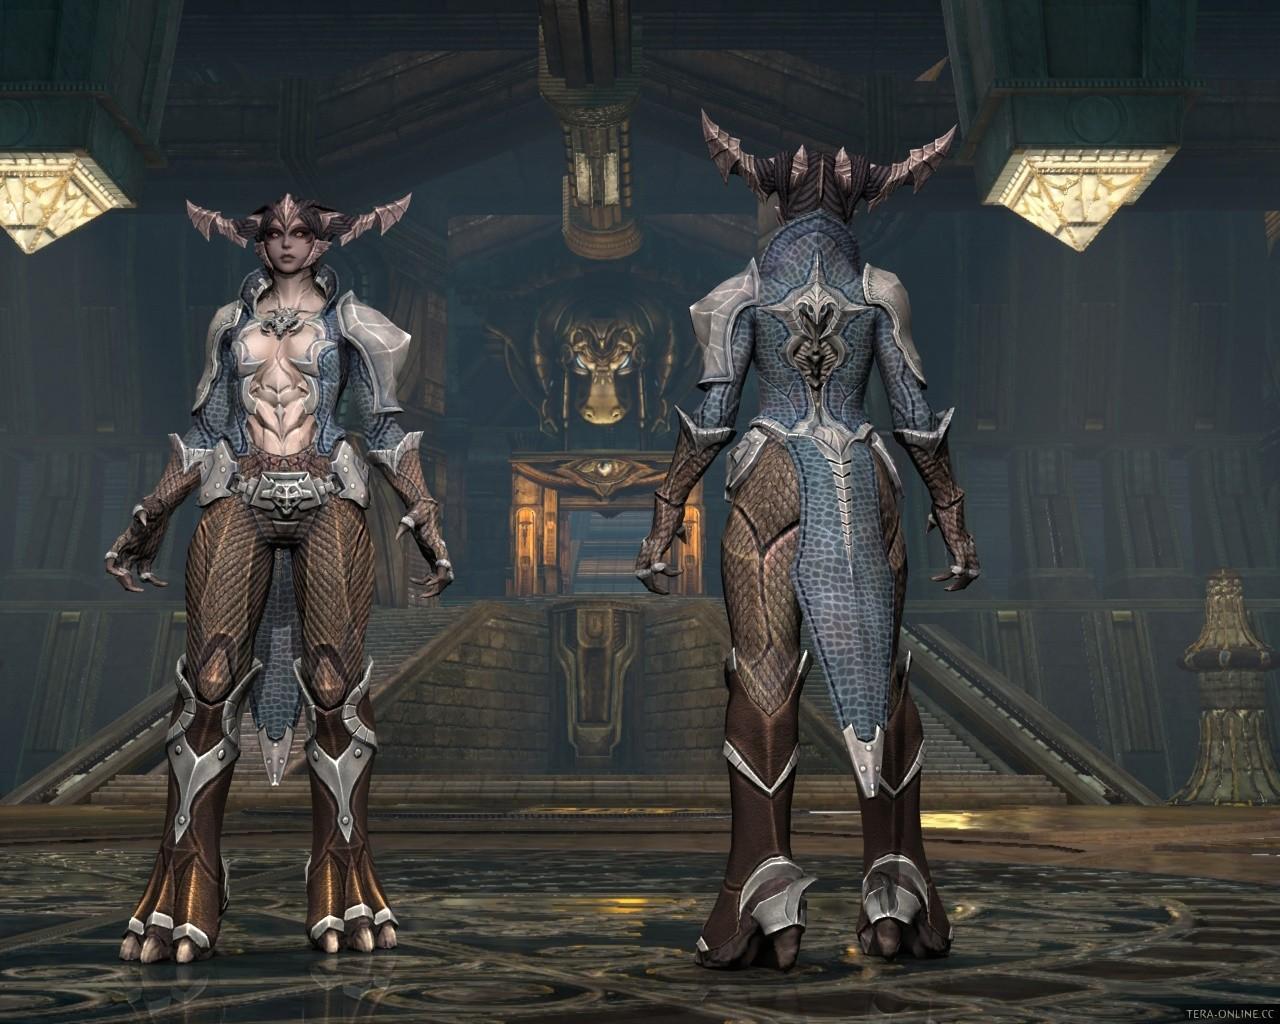 Portal Aoc Terra : Aman female leather armor mmorpg.com tera galleries